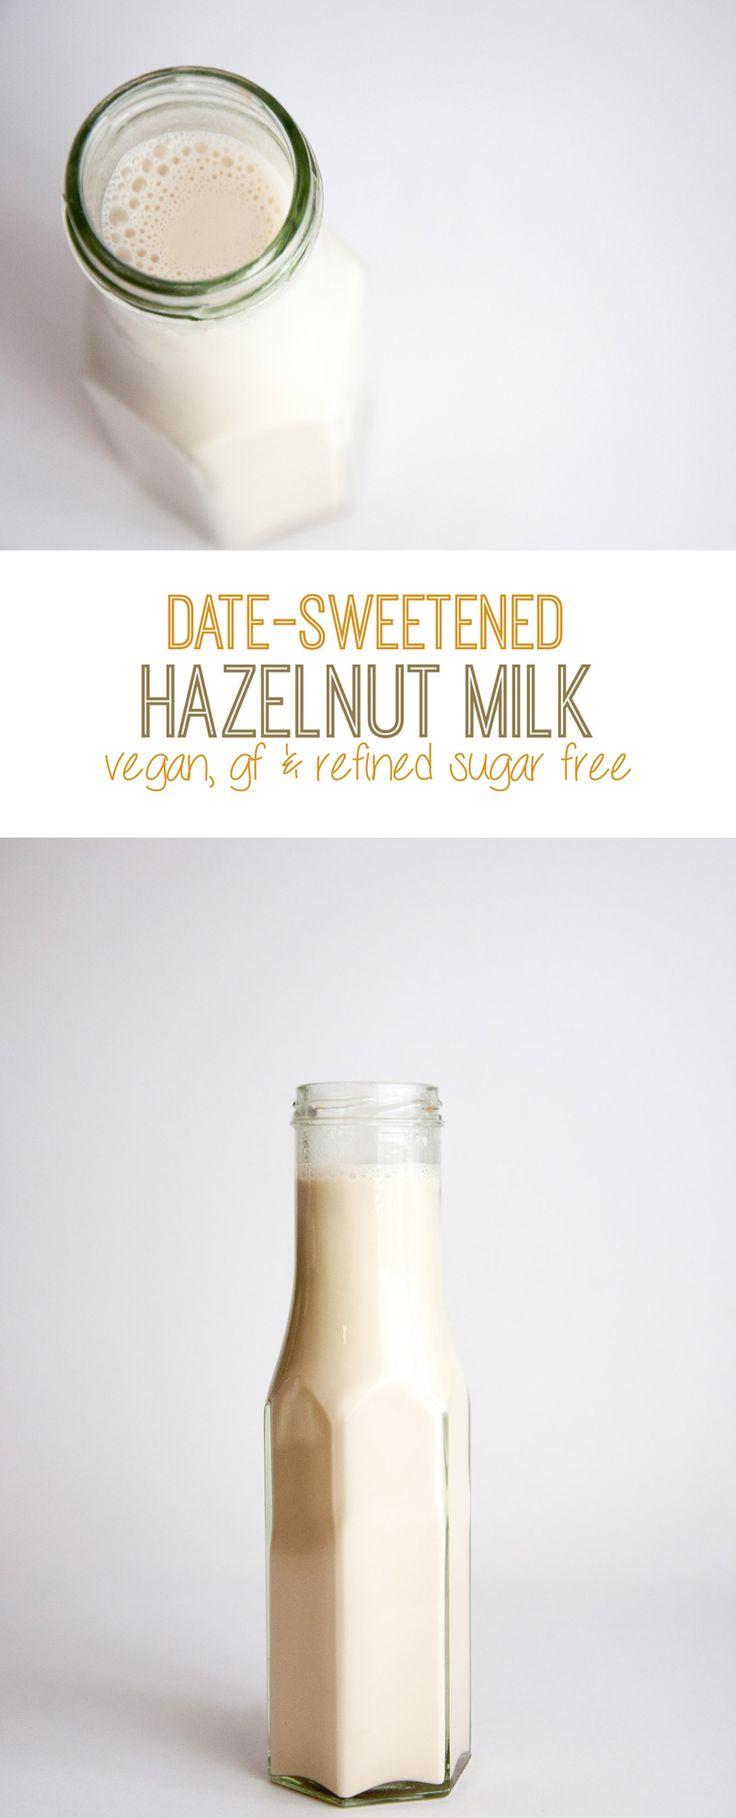 Date-Sweetened Hazelnut Milk #vegan #hazelnut #glutenfree #refinedsugarfree | ElephantasticVegan.com